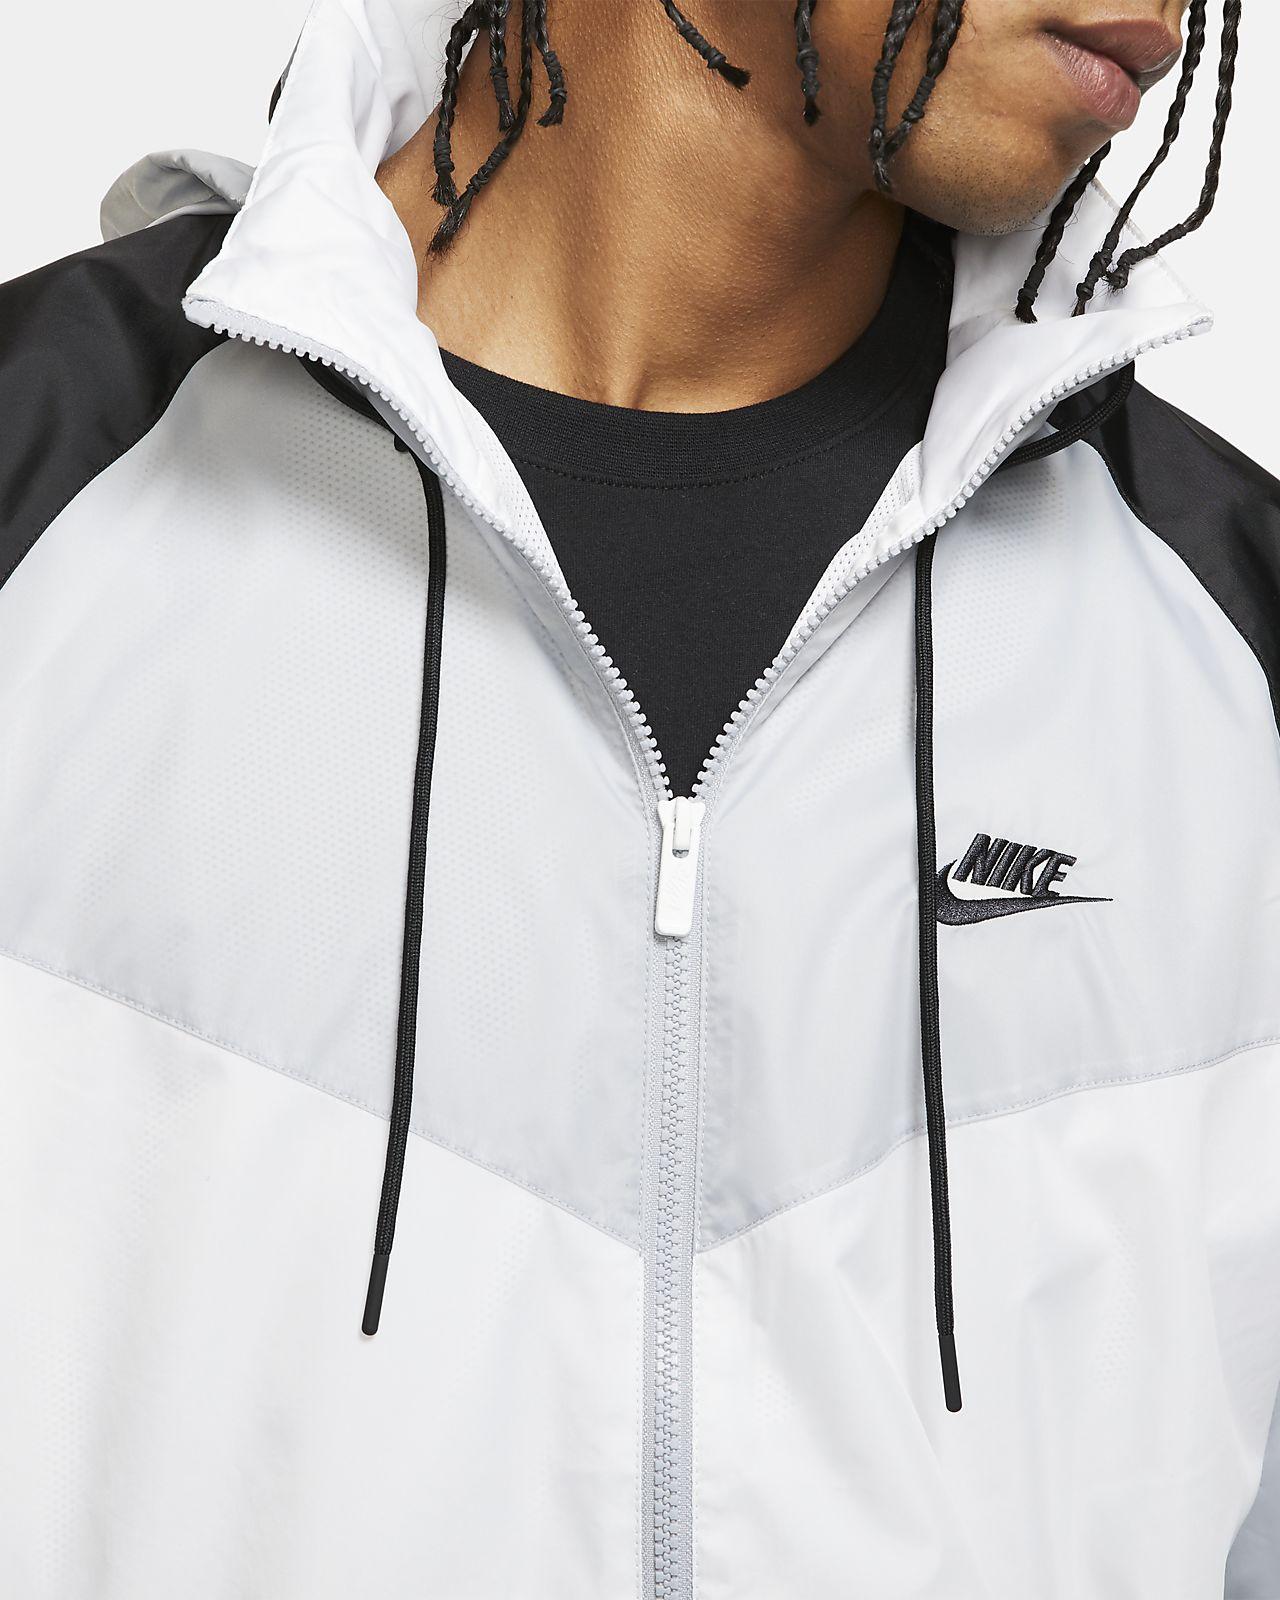 7e3e2bca0 Nike Sportswear Windrunner Hooded Jacket